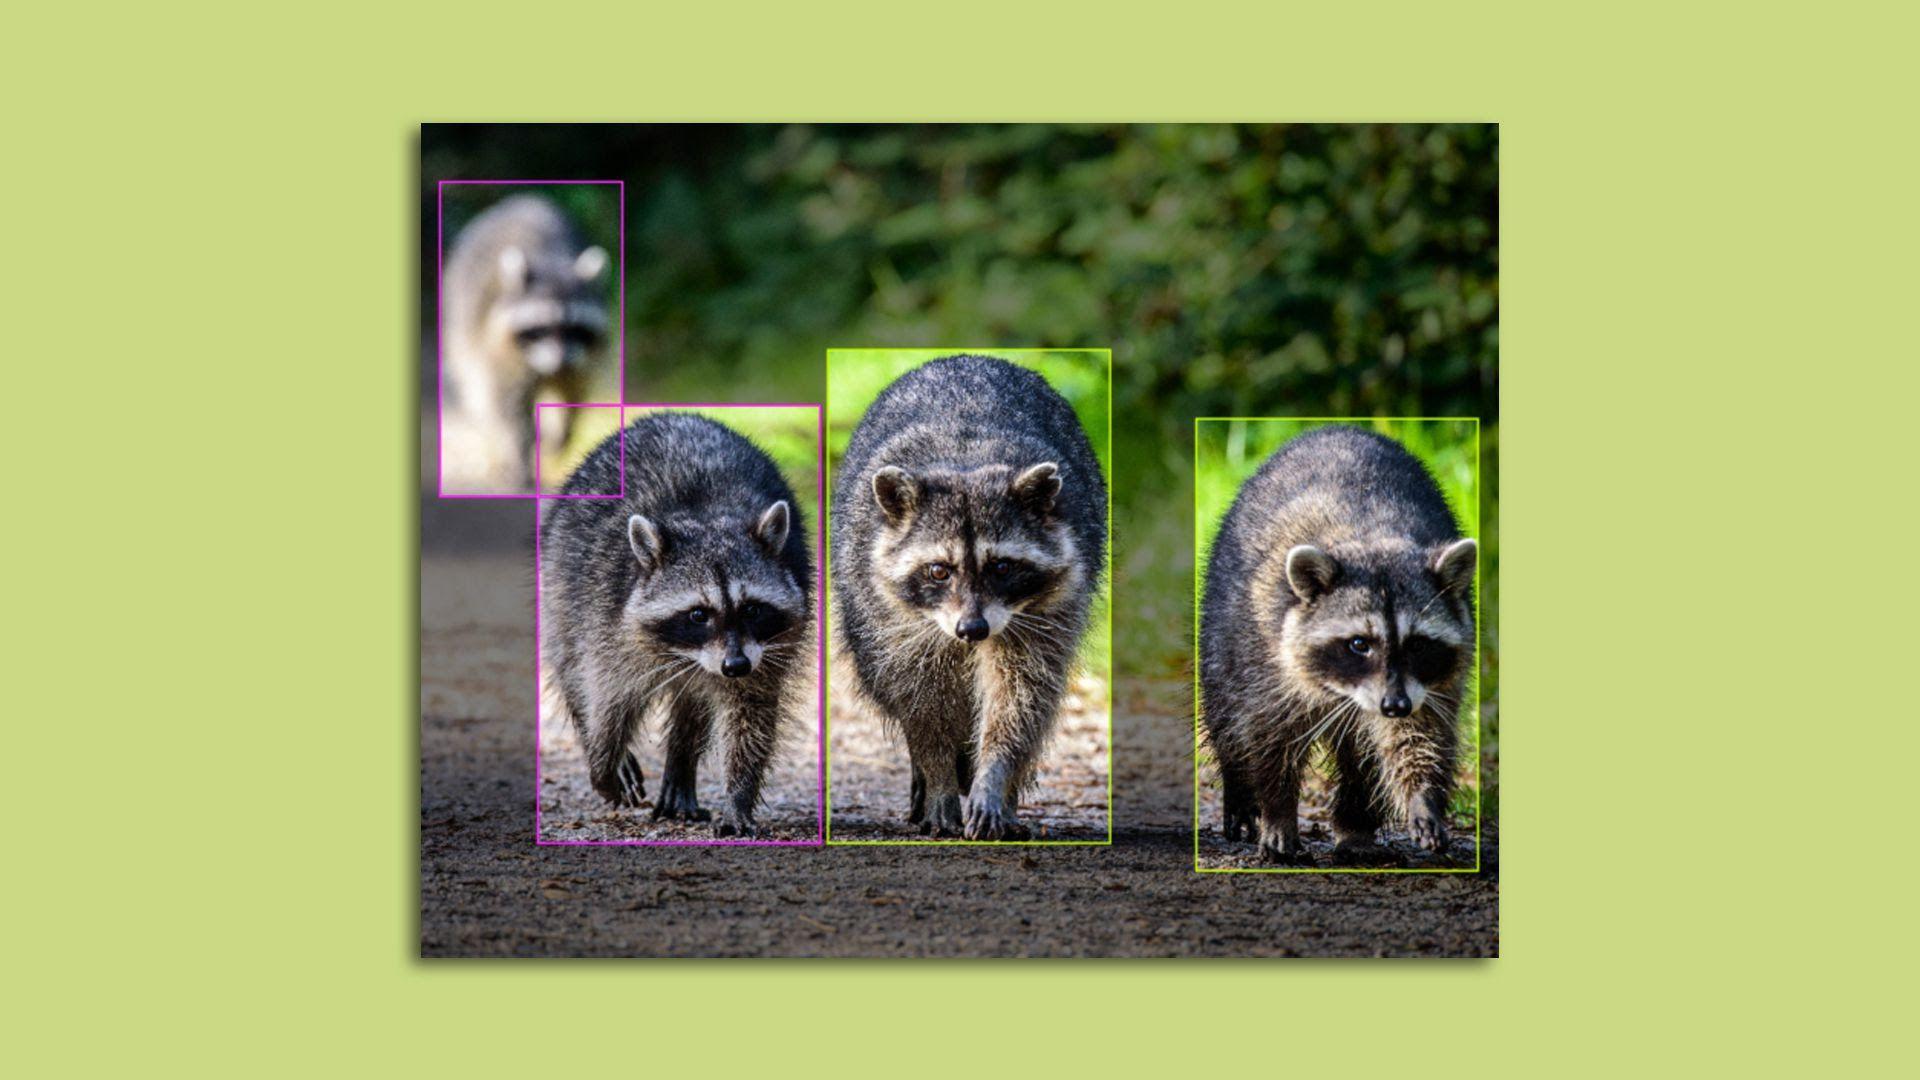 Computer vision technology tracks raccoons.